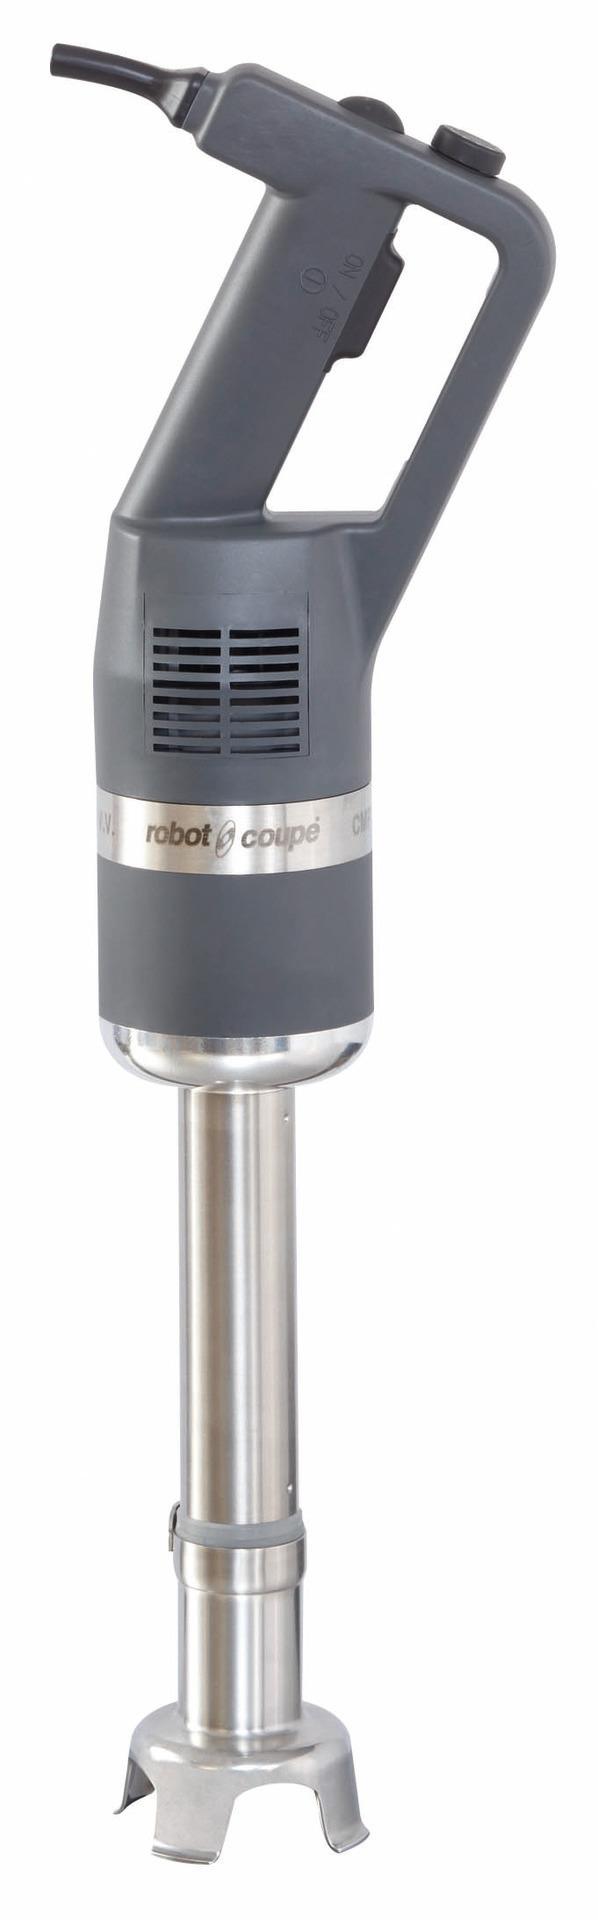 Stabmixer CMP 250 mm / 230 V / 0,31 kW